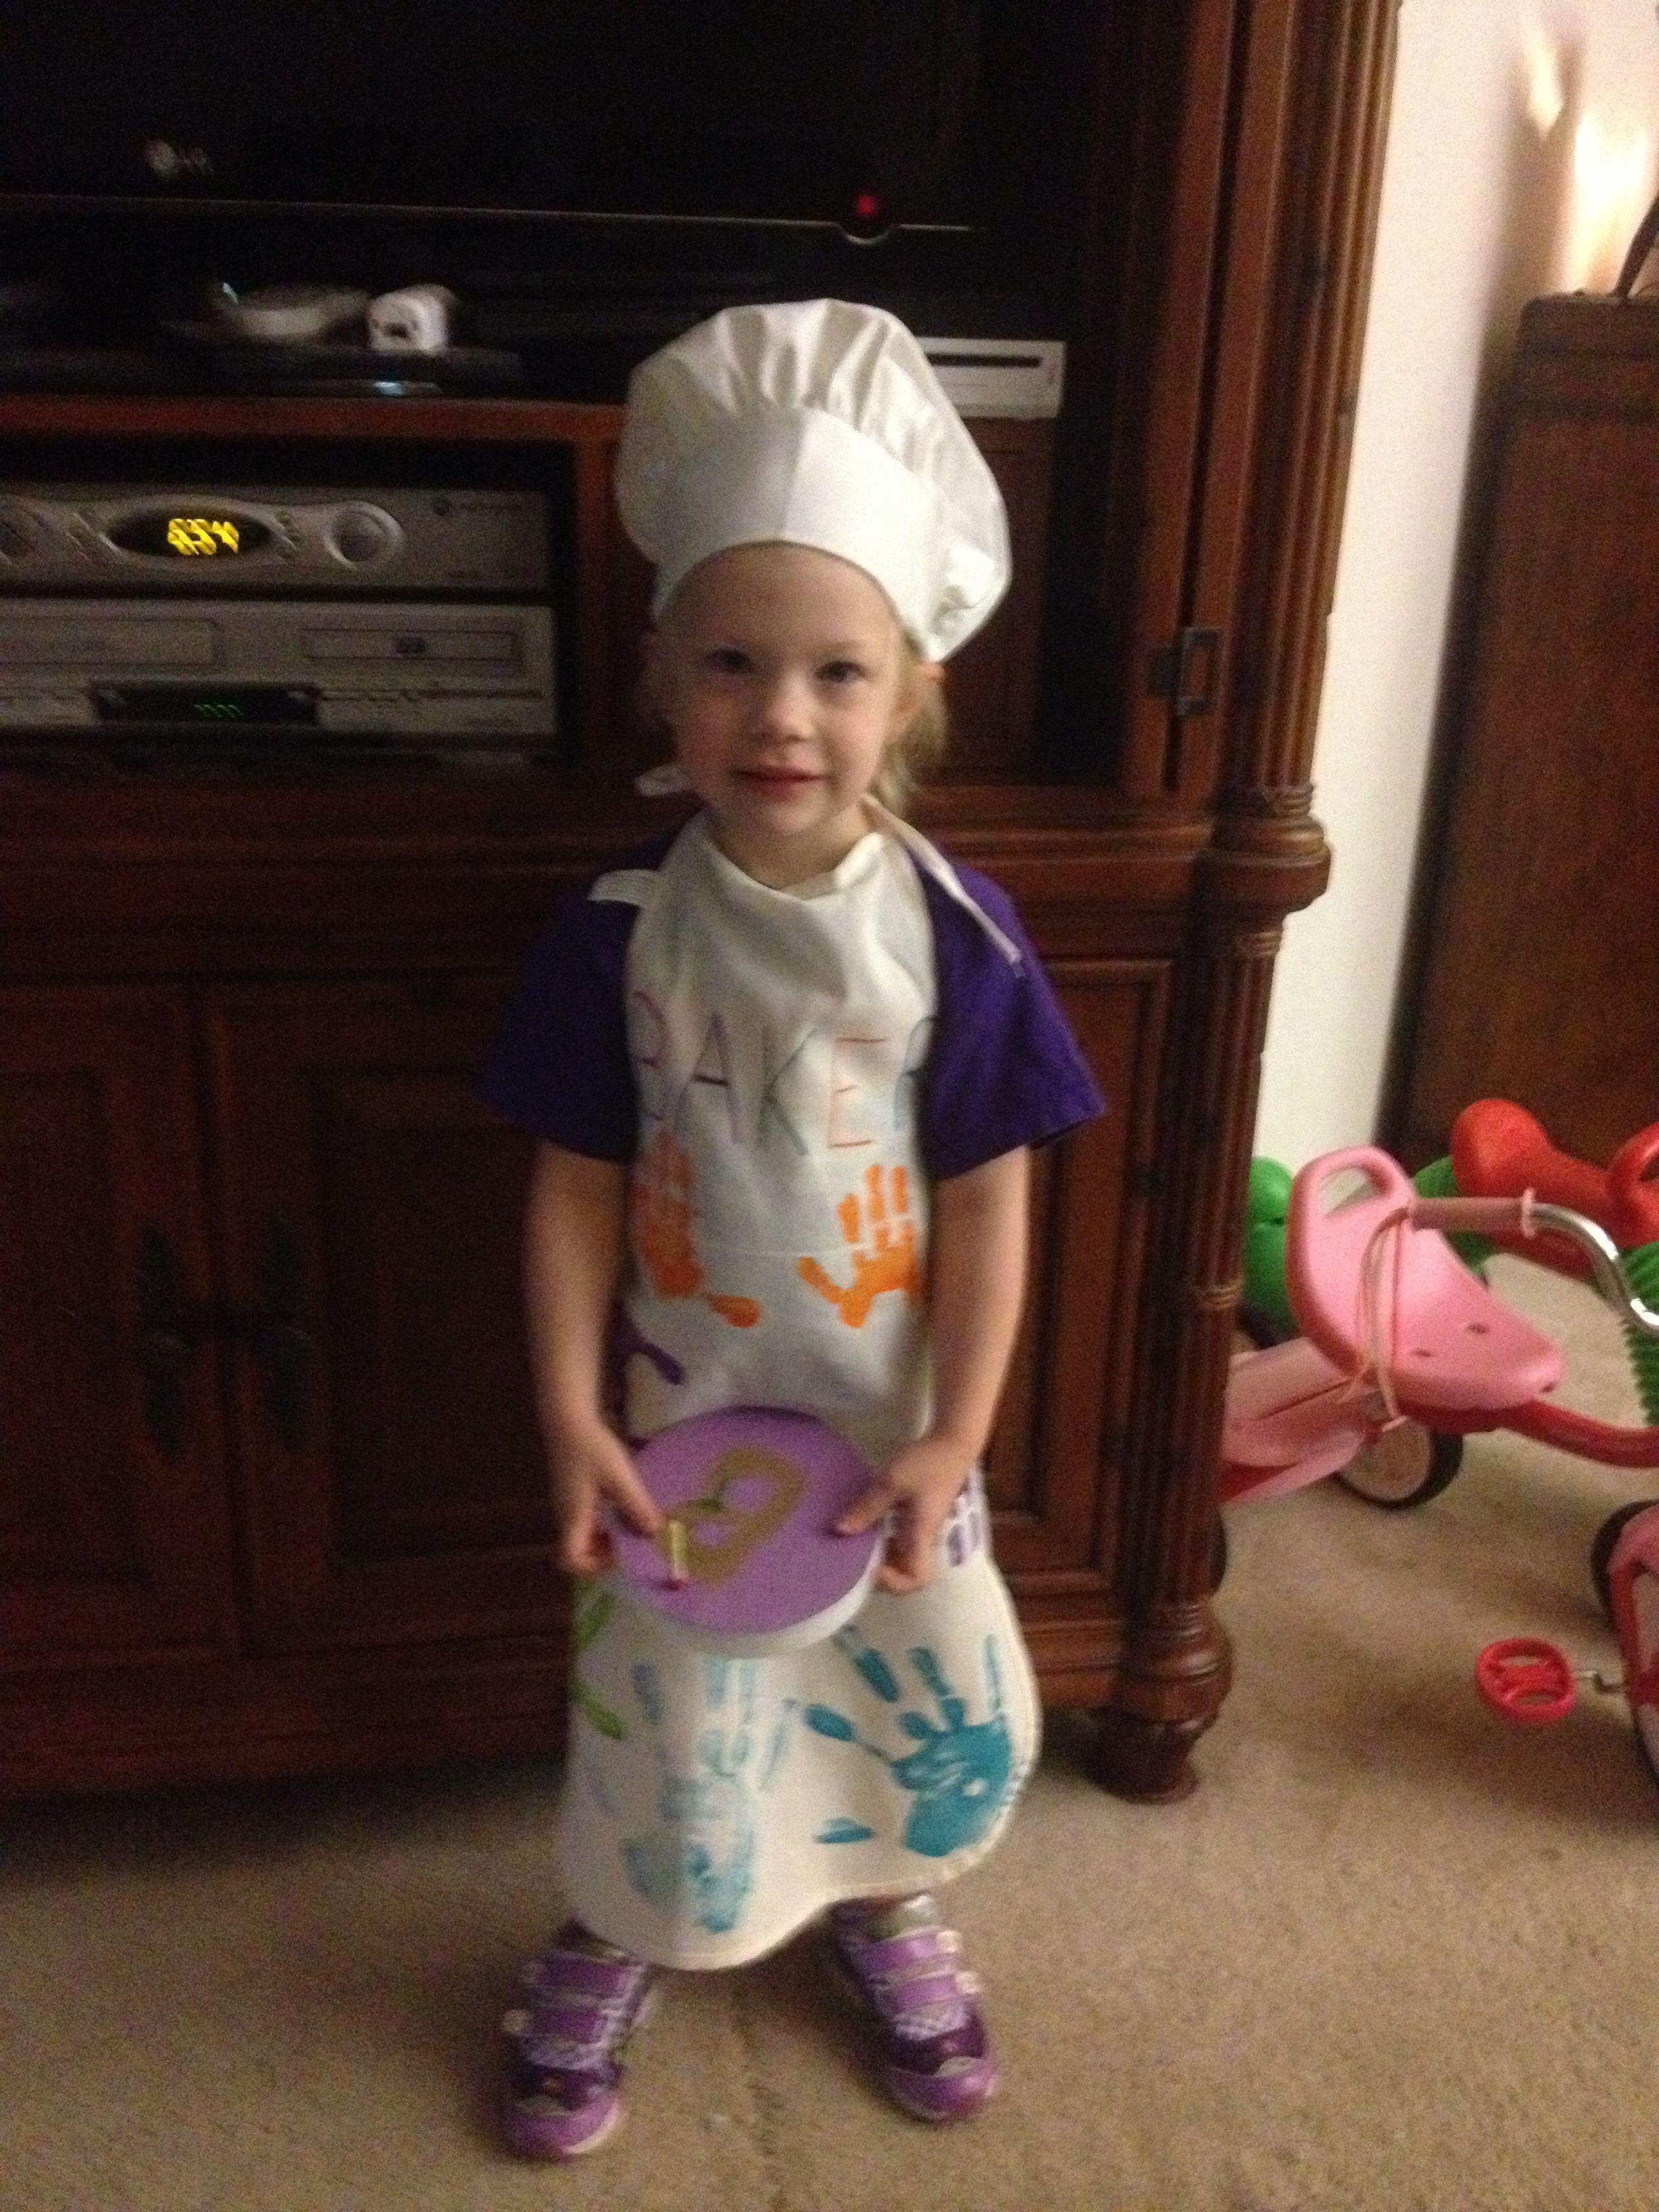 7 Bake Me A Cake Patty Cake Patty Cake Bakers Man Bake Me A Cake